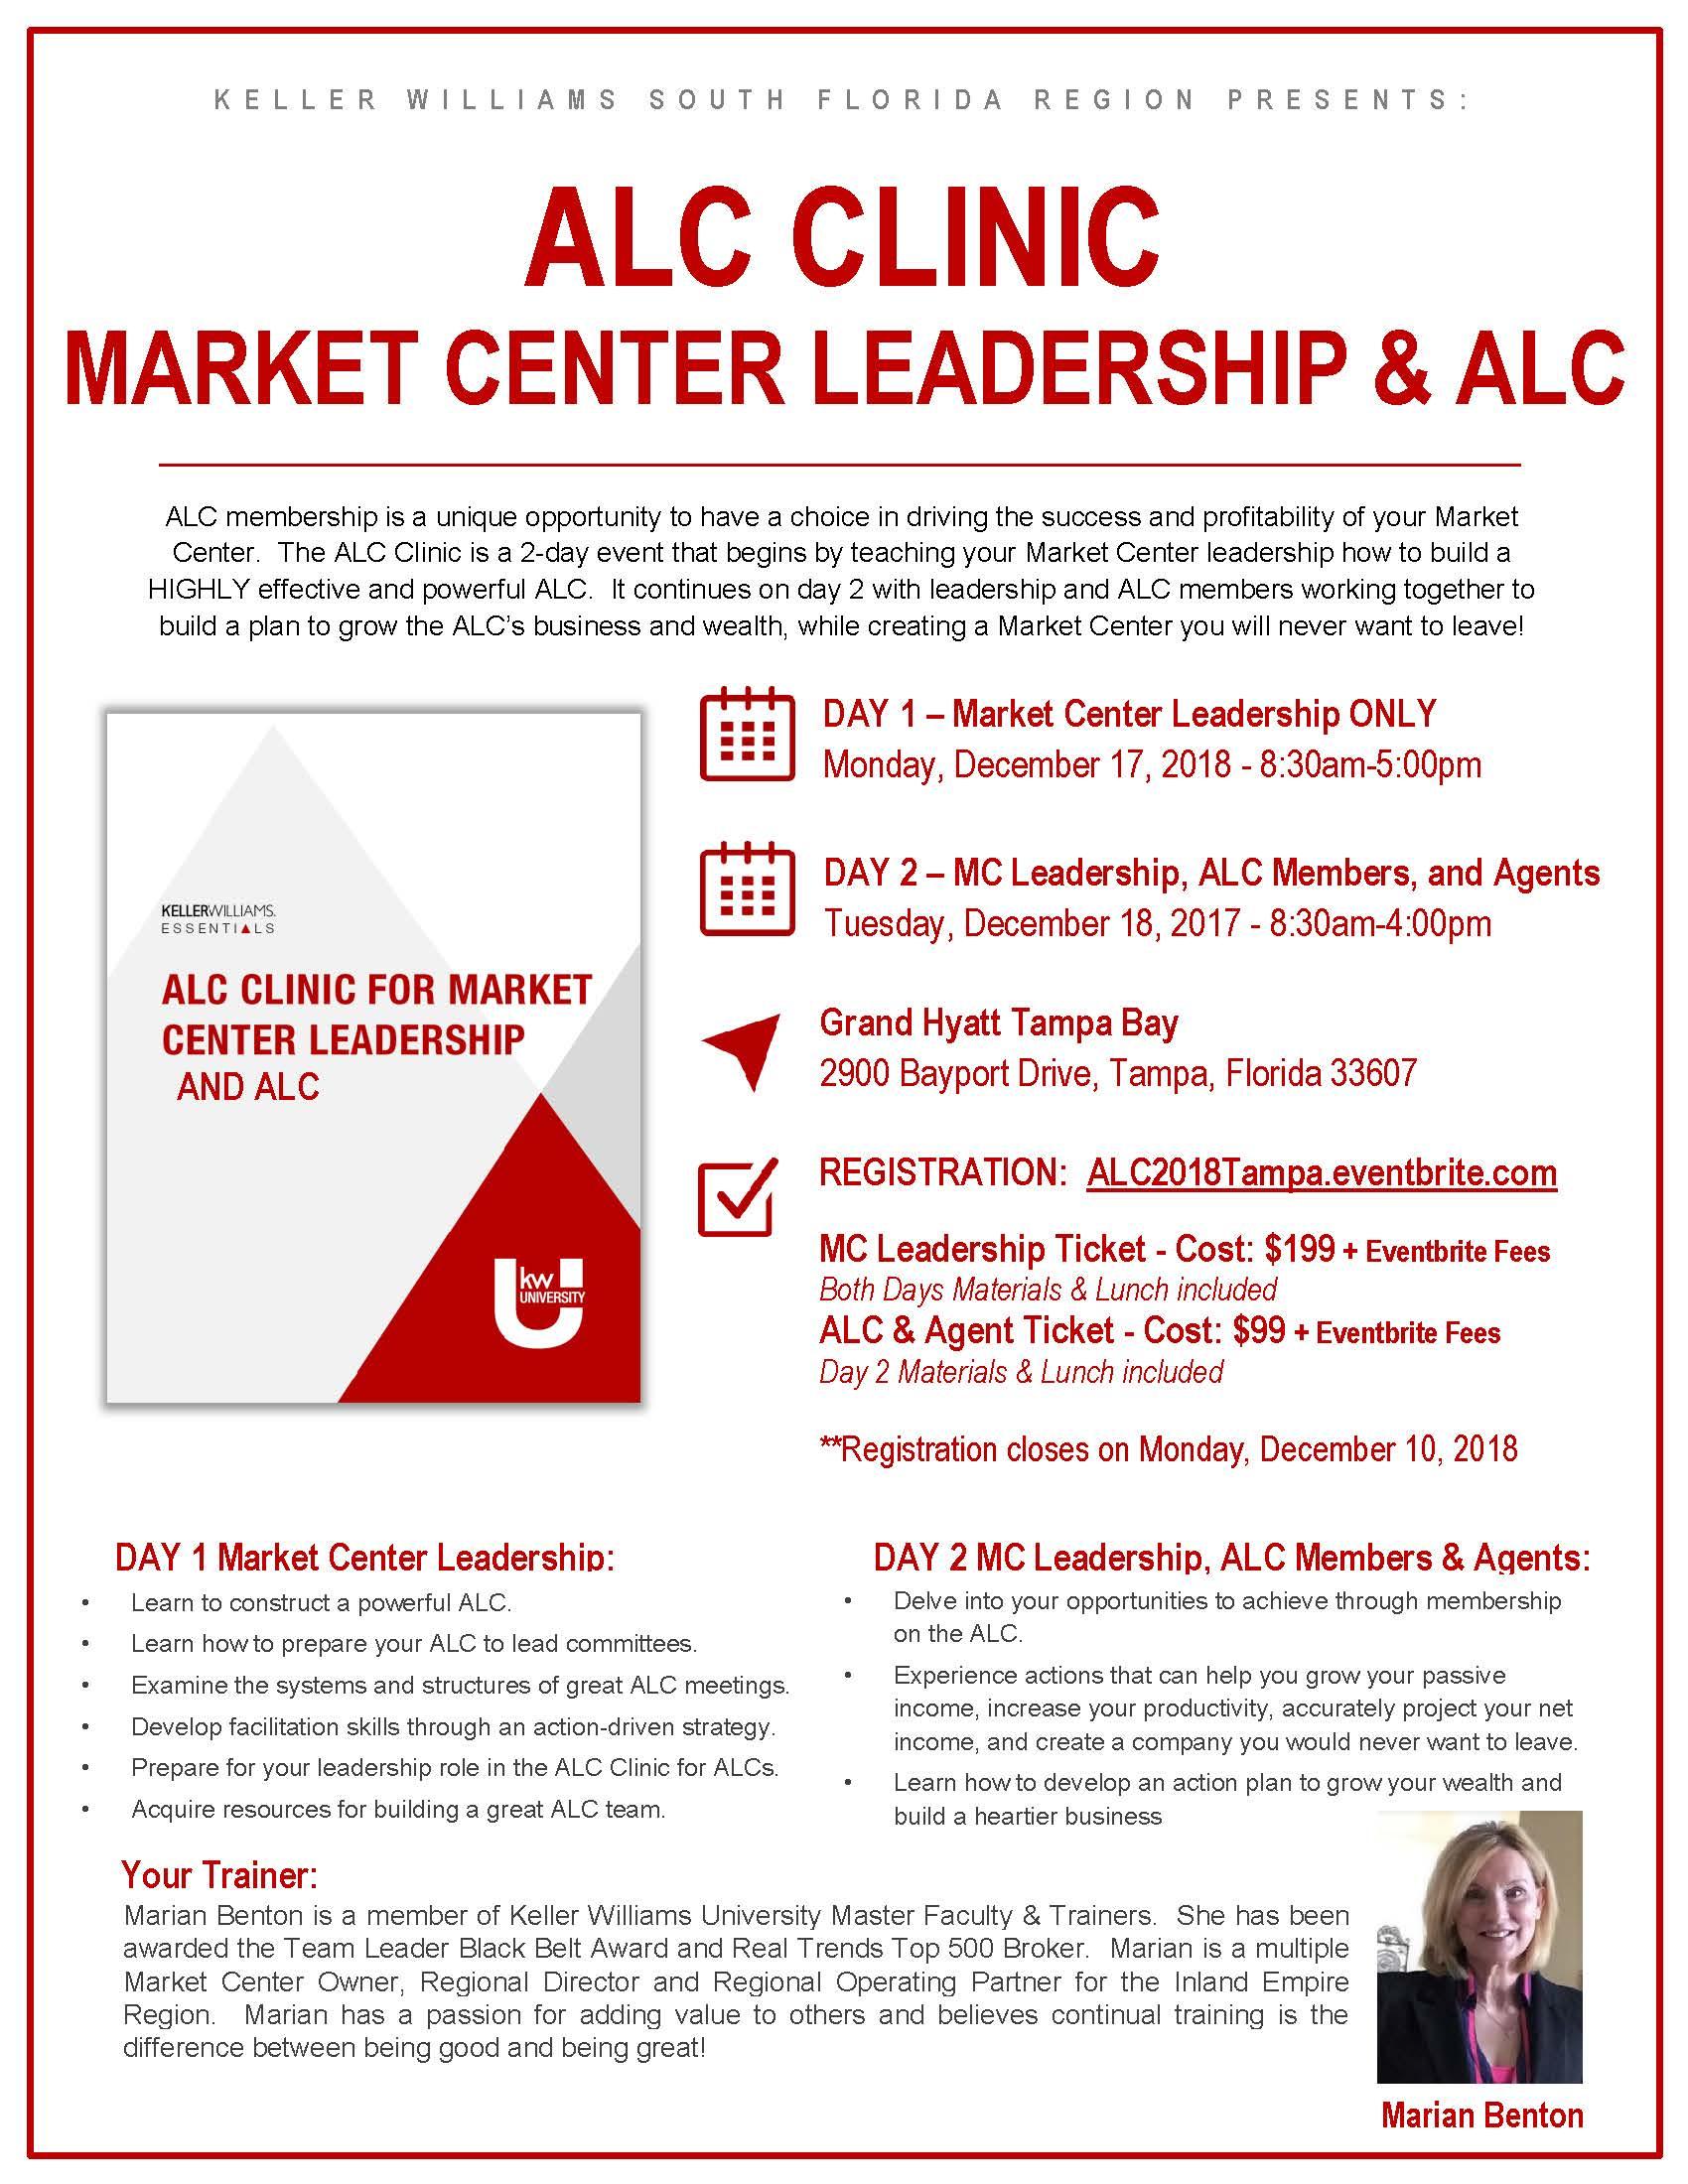 ALC Clinic 12.17-18.18 Marian Benton